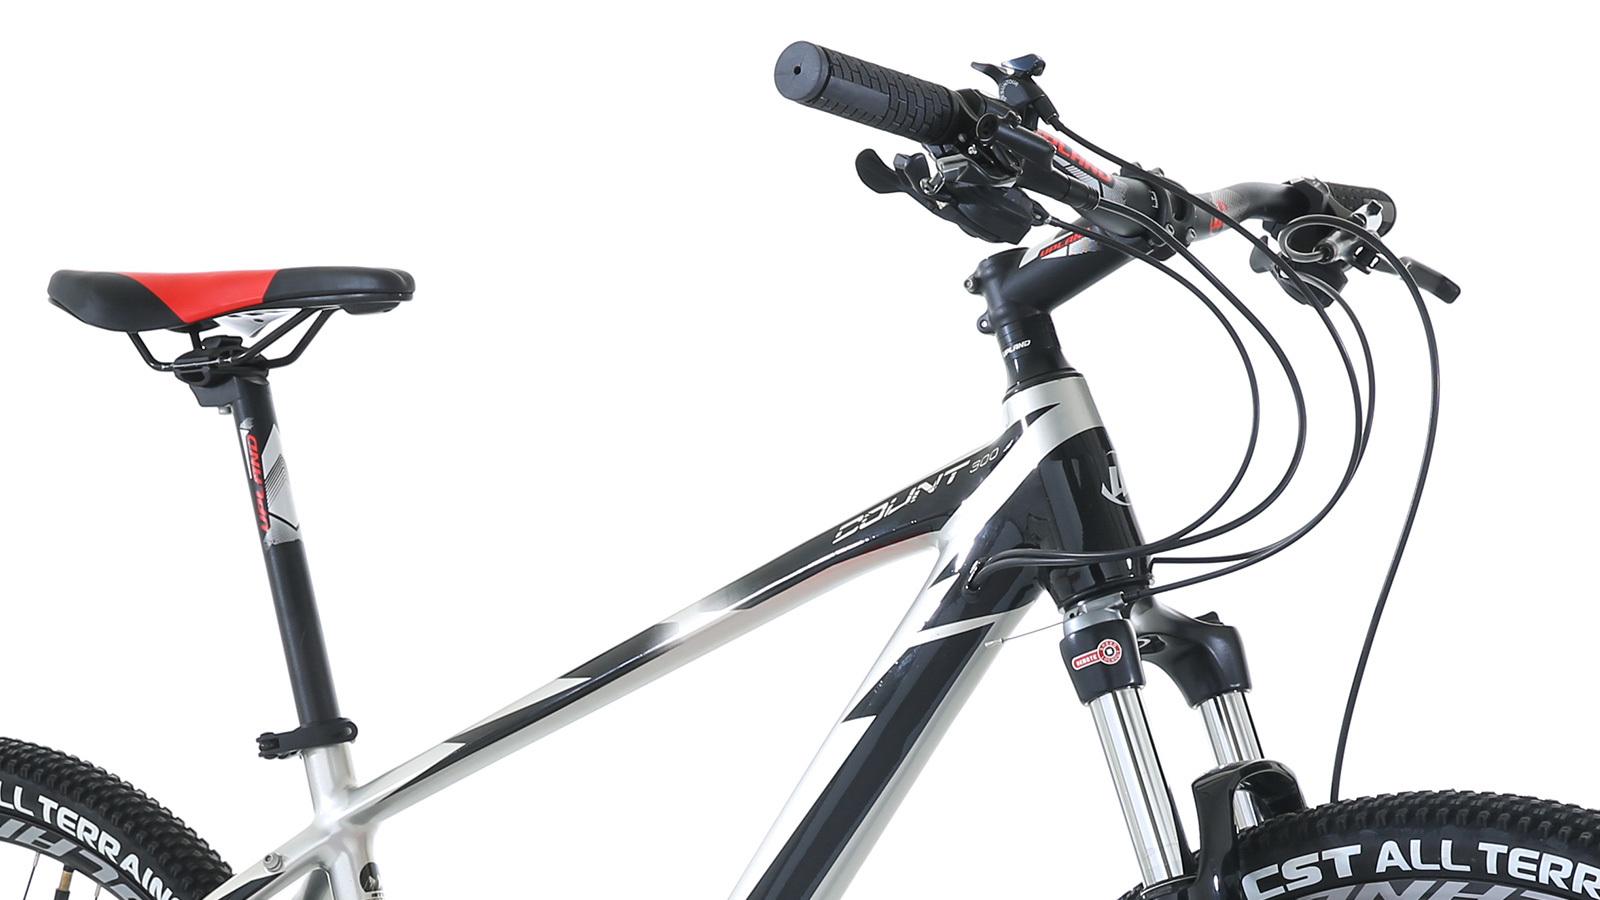 рама, руль и вилка горного велосипеда